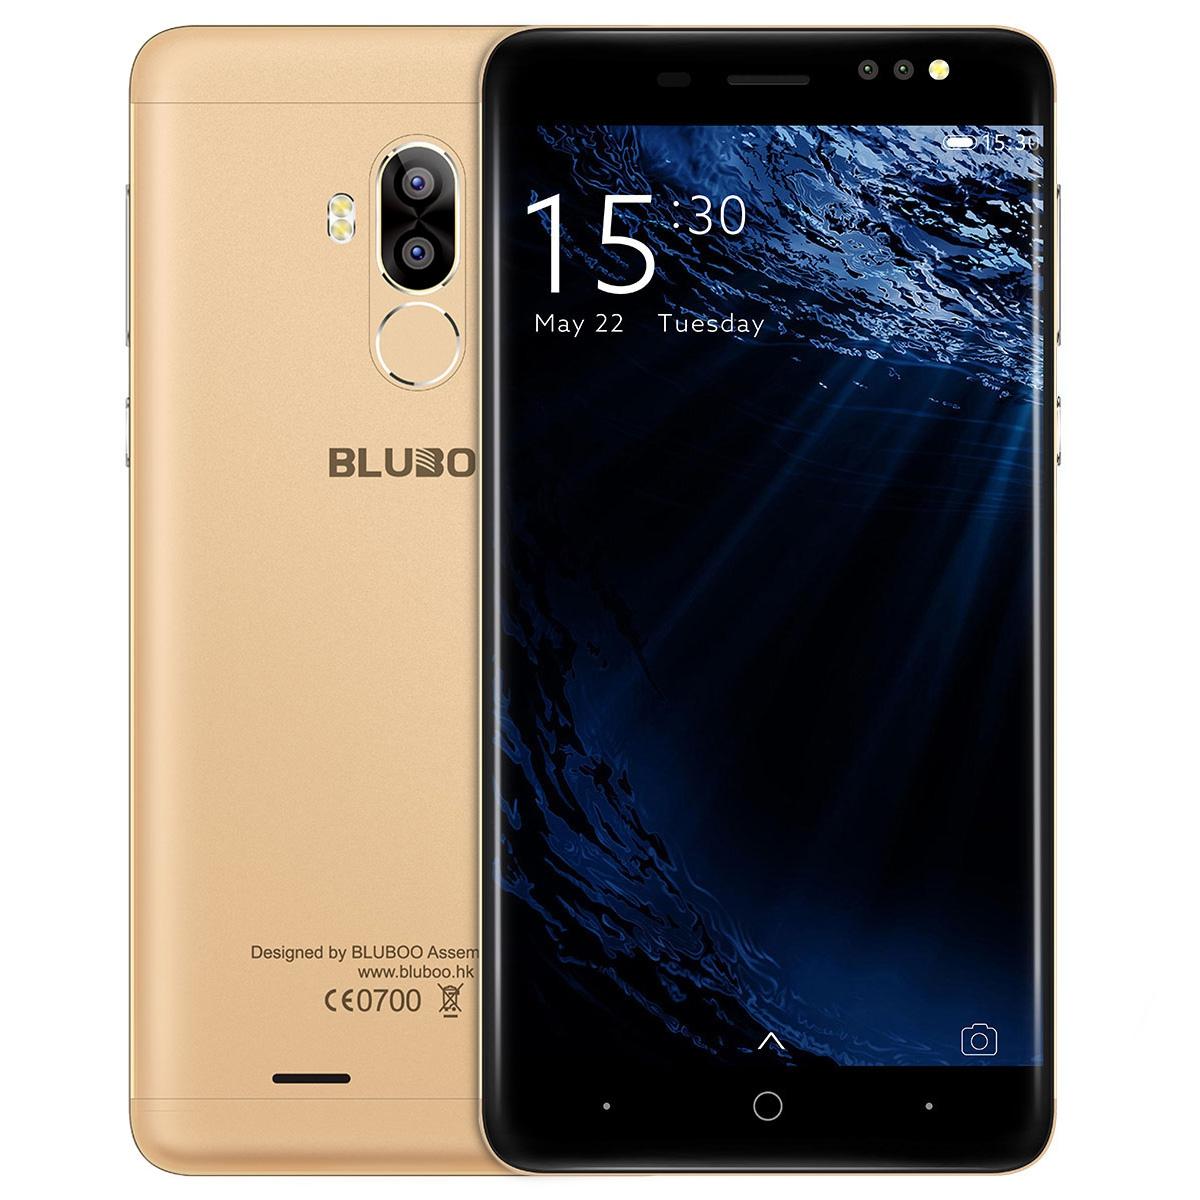 BLUBOO Шампанское Золотое Стандарт ЕС bluboo dual 2gb 16gb smartphone rose gold